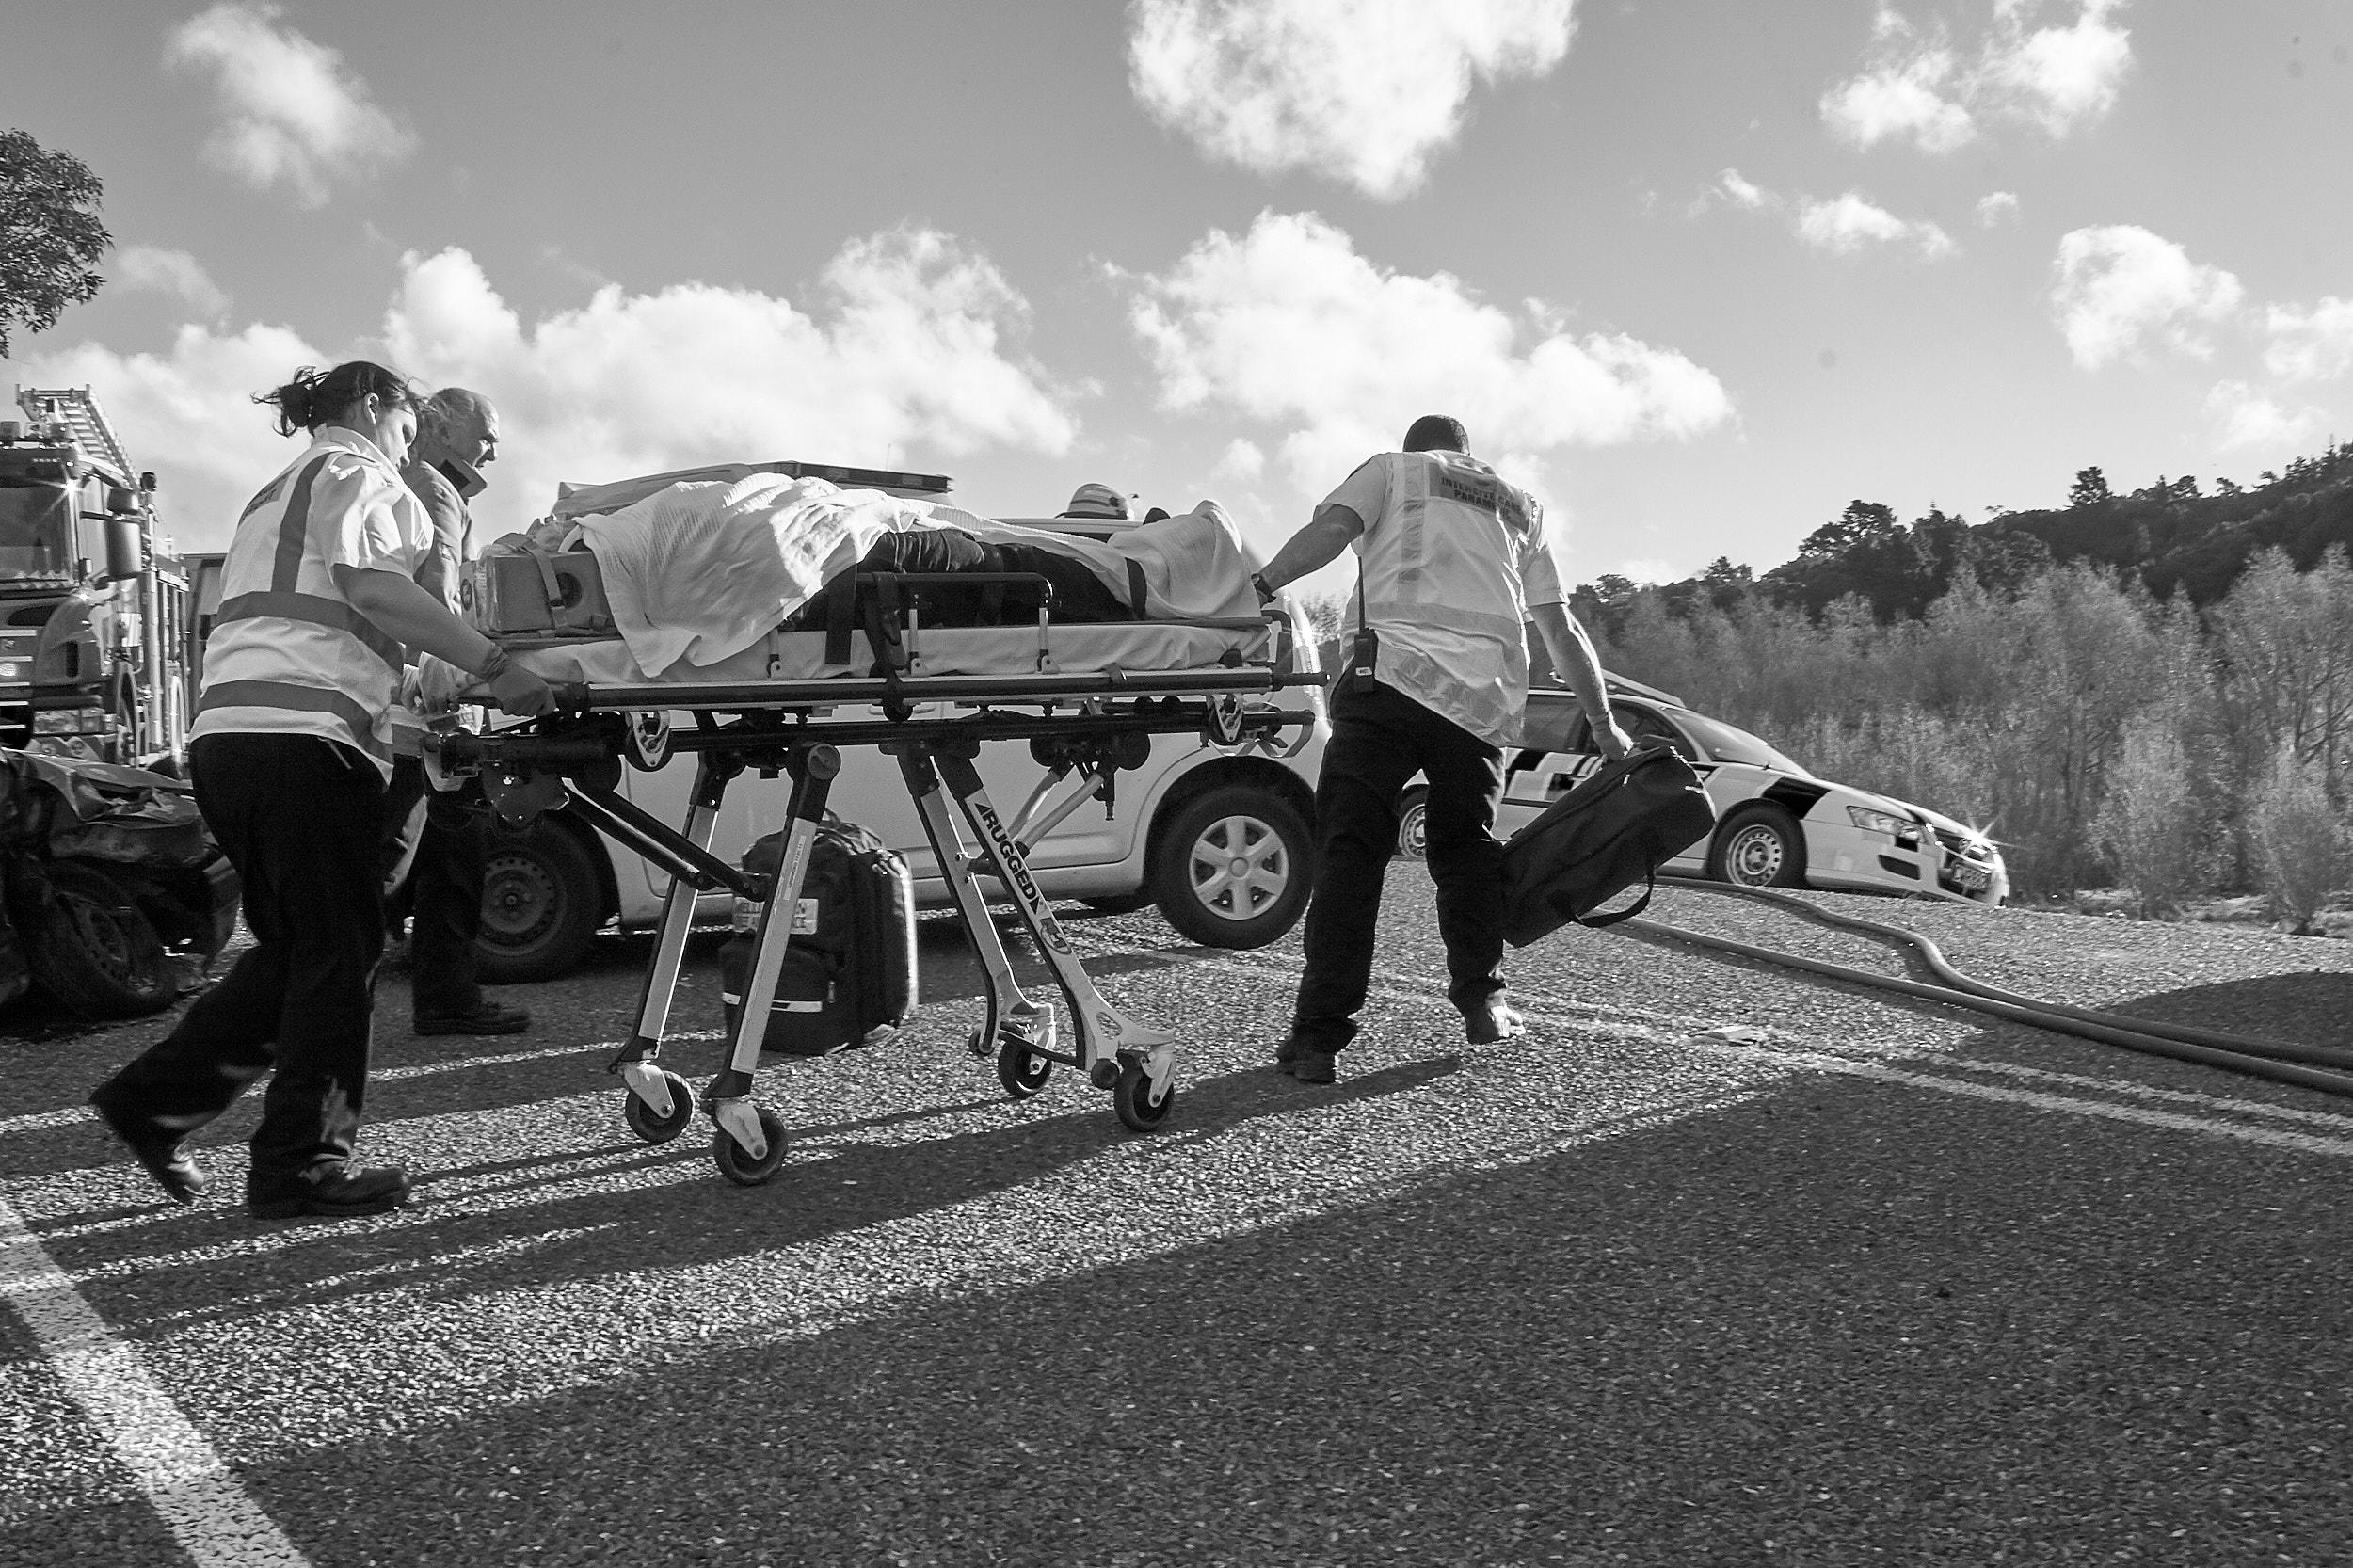 Ambulance at work